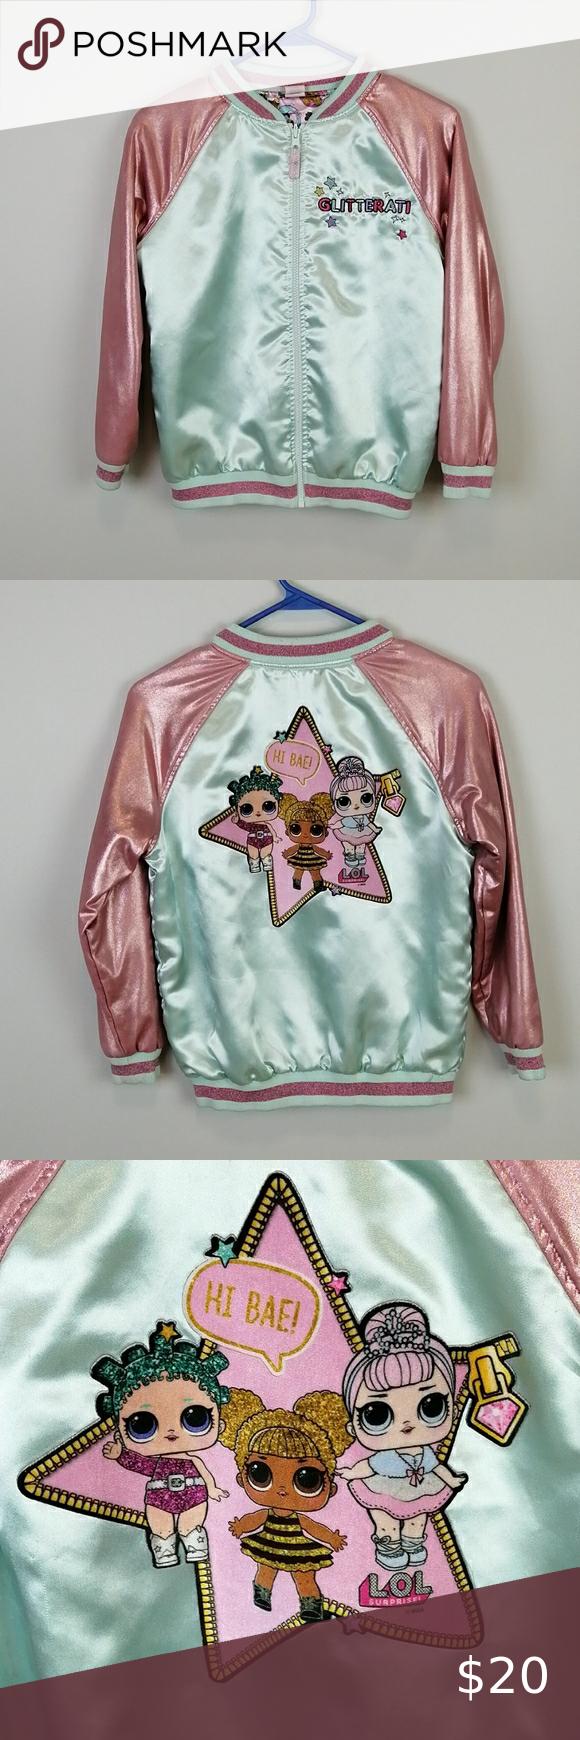 L O L Dolls Satin Reversible Bomber Jacket Size L Girls Puffer Coat Boys Pea Coat Toddler Winter Jackets [ 1740 x 580 Pixel ]